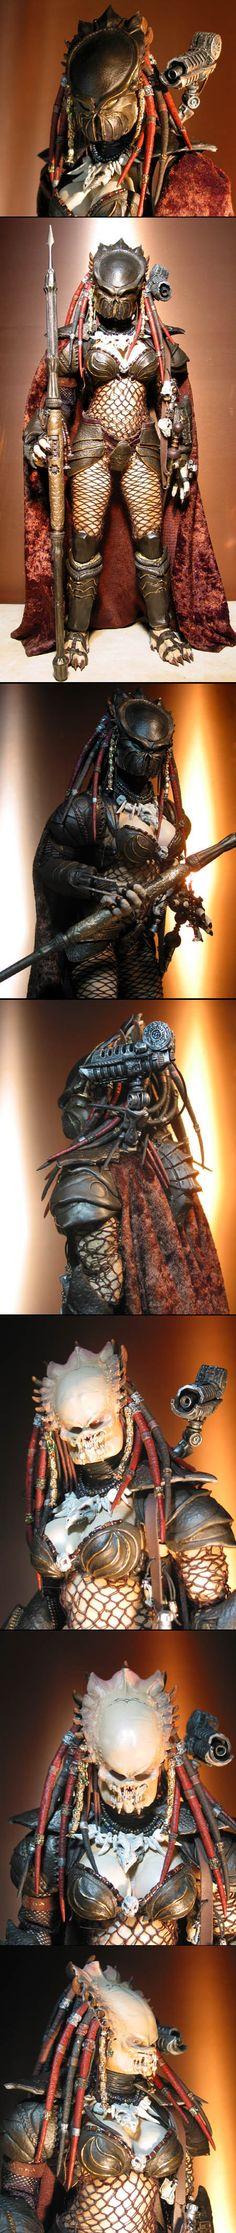 Female Predators in comics Predator Series, Alien Vs Predator, Alien Creatures, Fantasy Creatures, Aliens Colonial Marines, Tribal Warrior, Black Comics, Alien Concept, Sketches